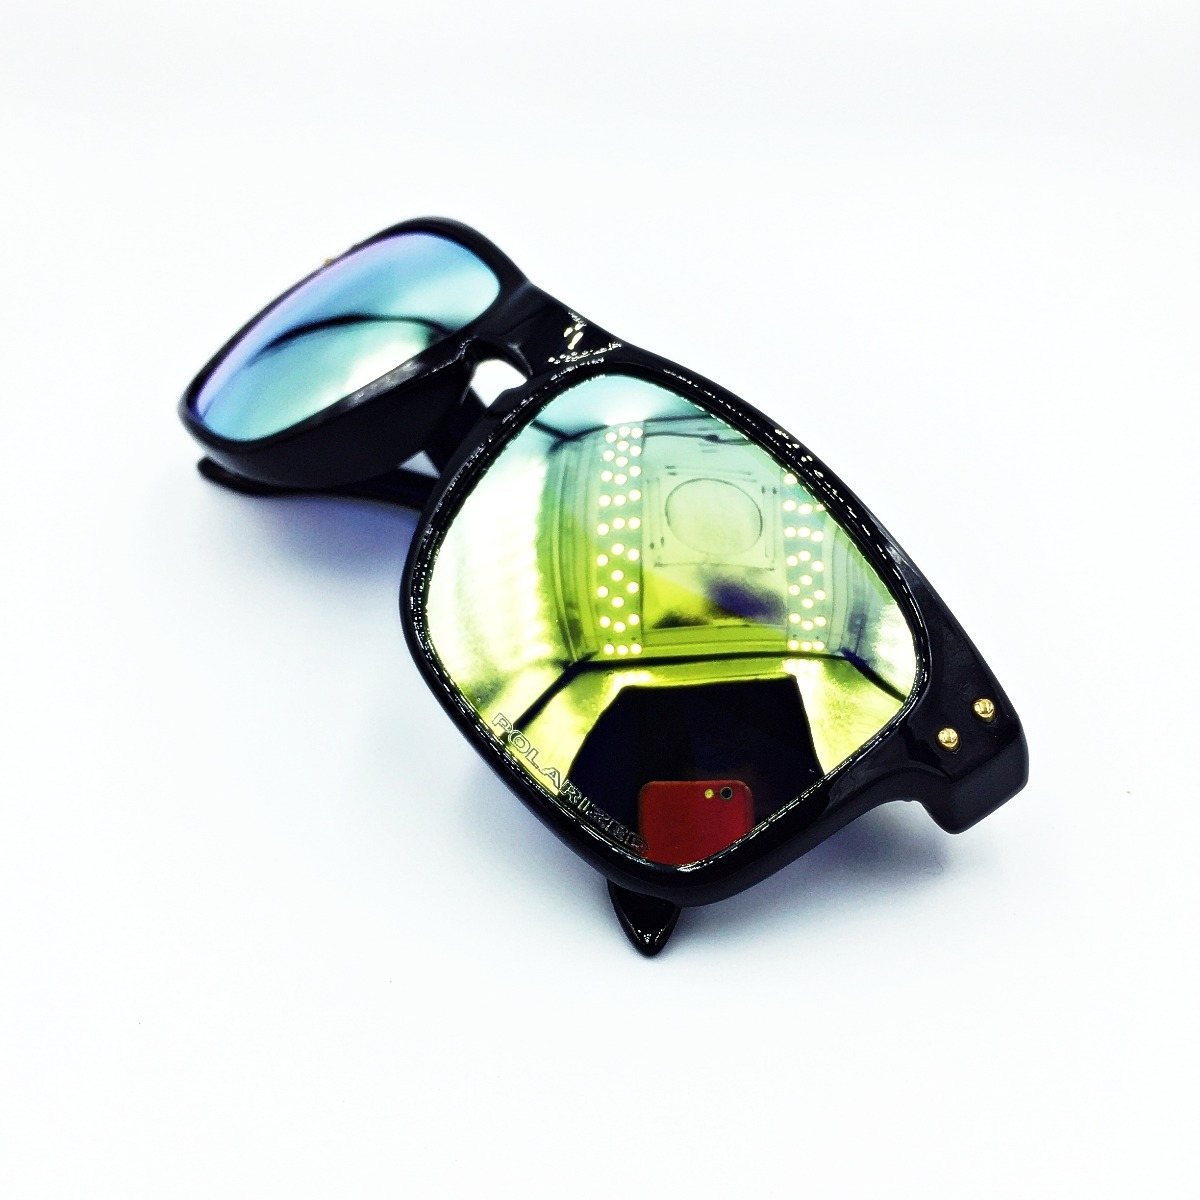 1868807498 oakley oo9102 08 holbrook dorado flash polarized +metal case. 9 Fotos